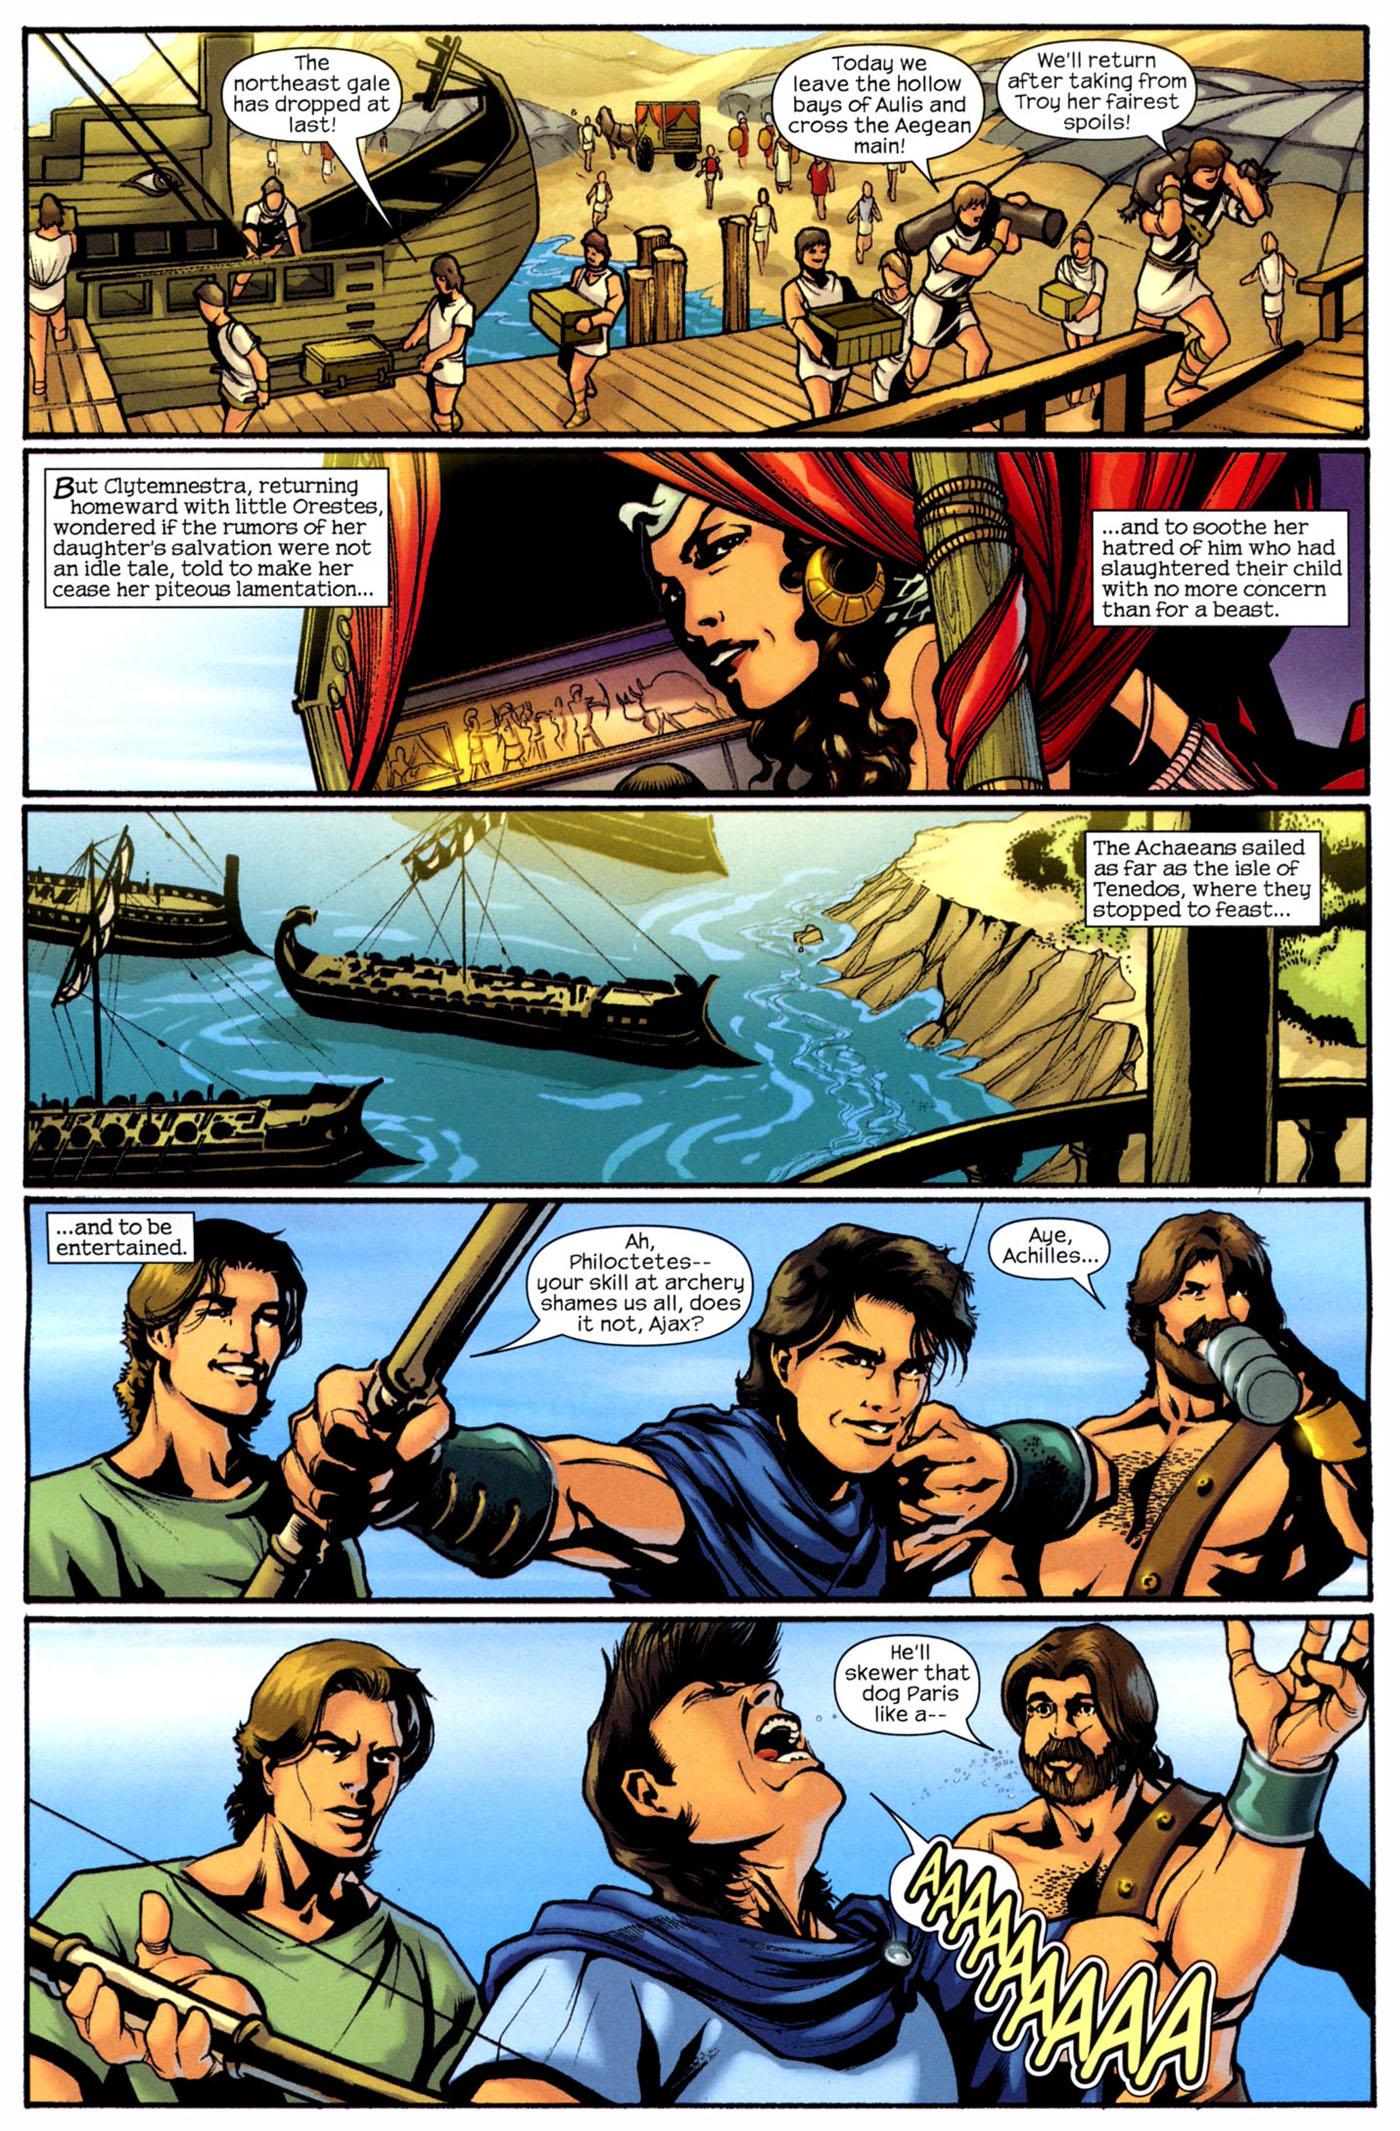 Read online Trojan War comic -  Issue #2 - 10